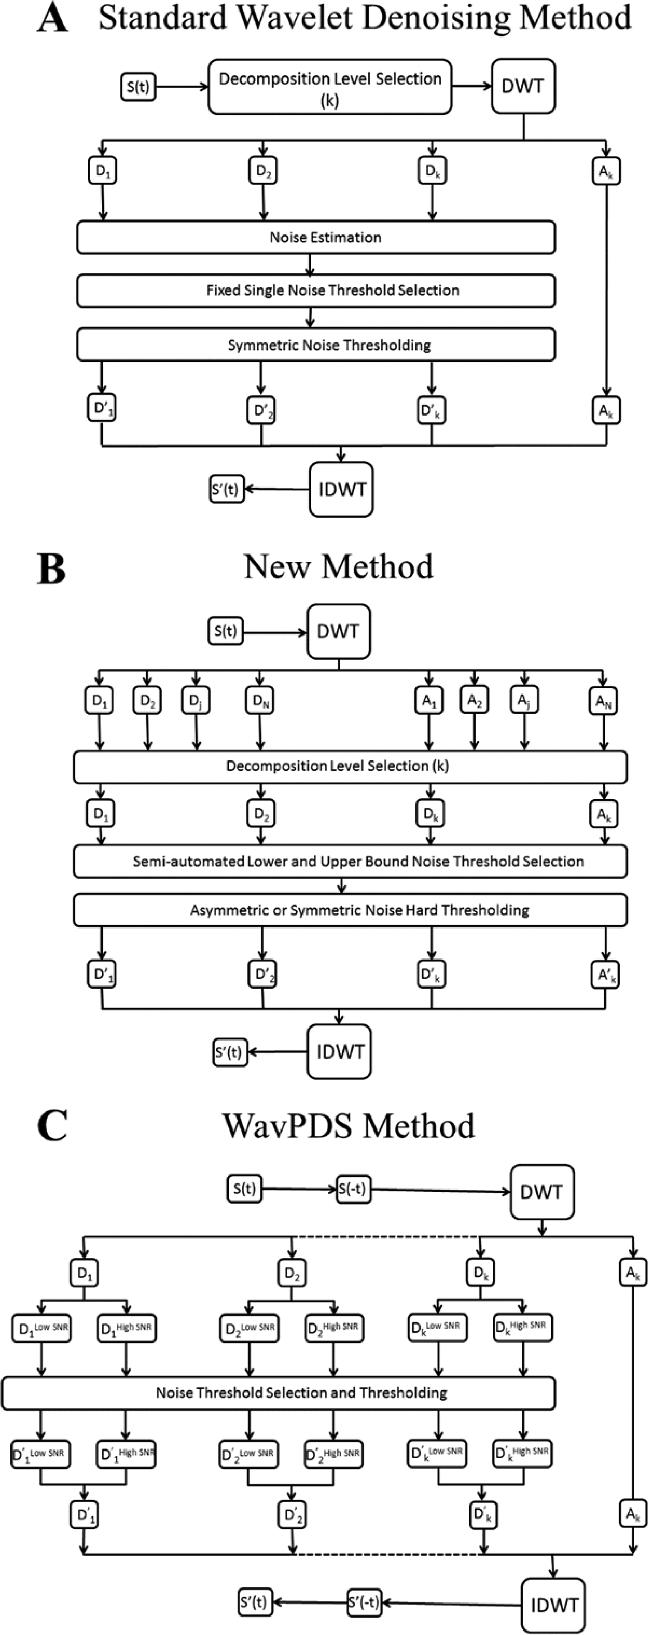 (A) Block diagram of a standard wavelet denoising method